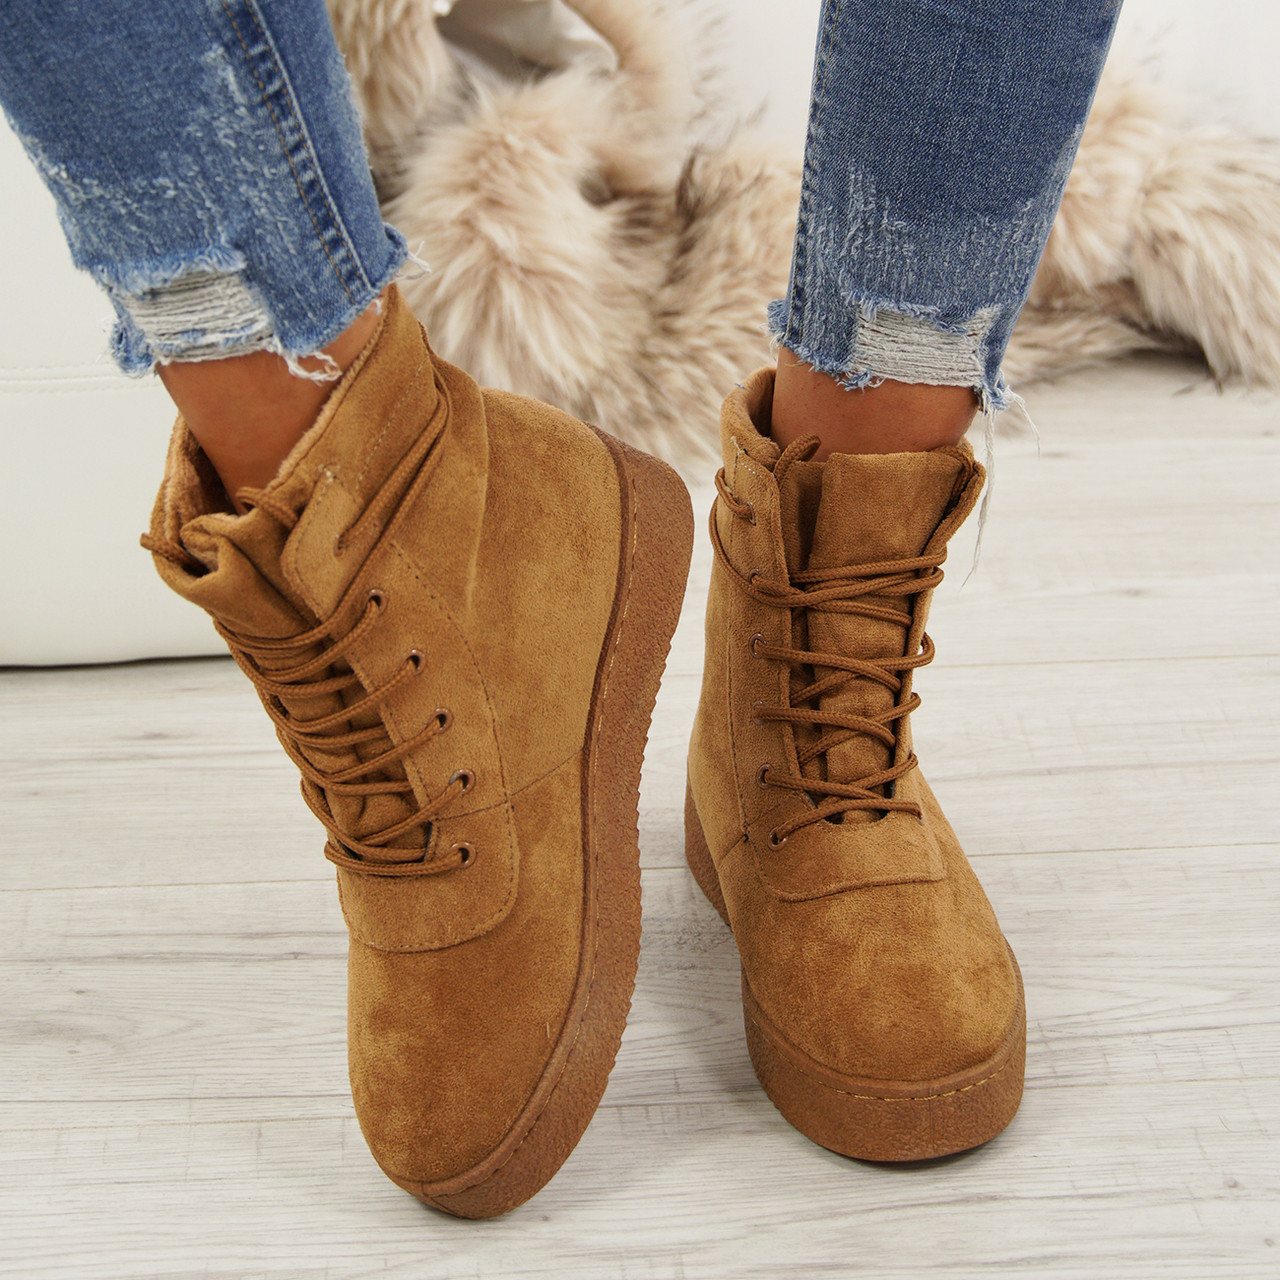 latest discount finest selection shop Ladies Lace Up Ankle Boots Womens Faux Suede Wedge Heels Platform ...